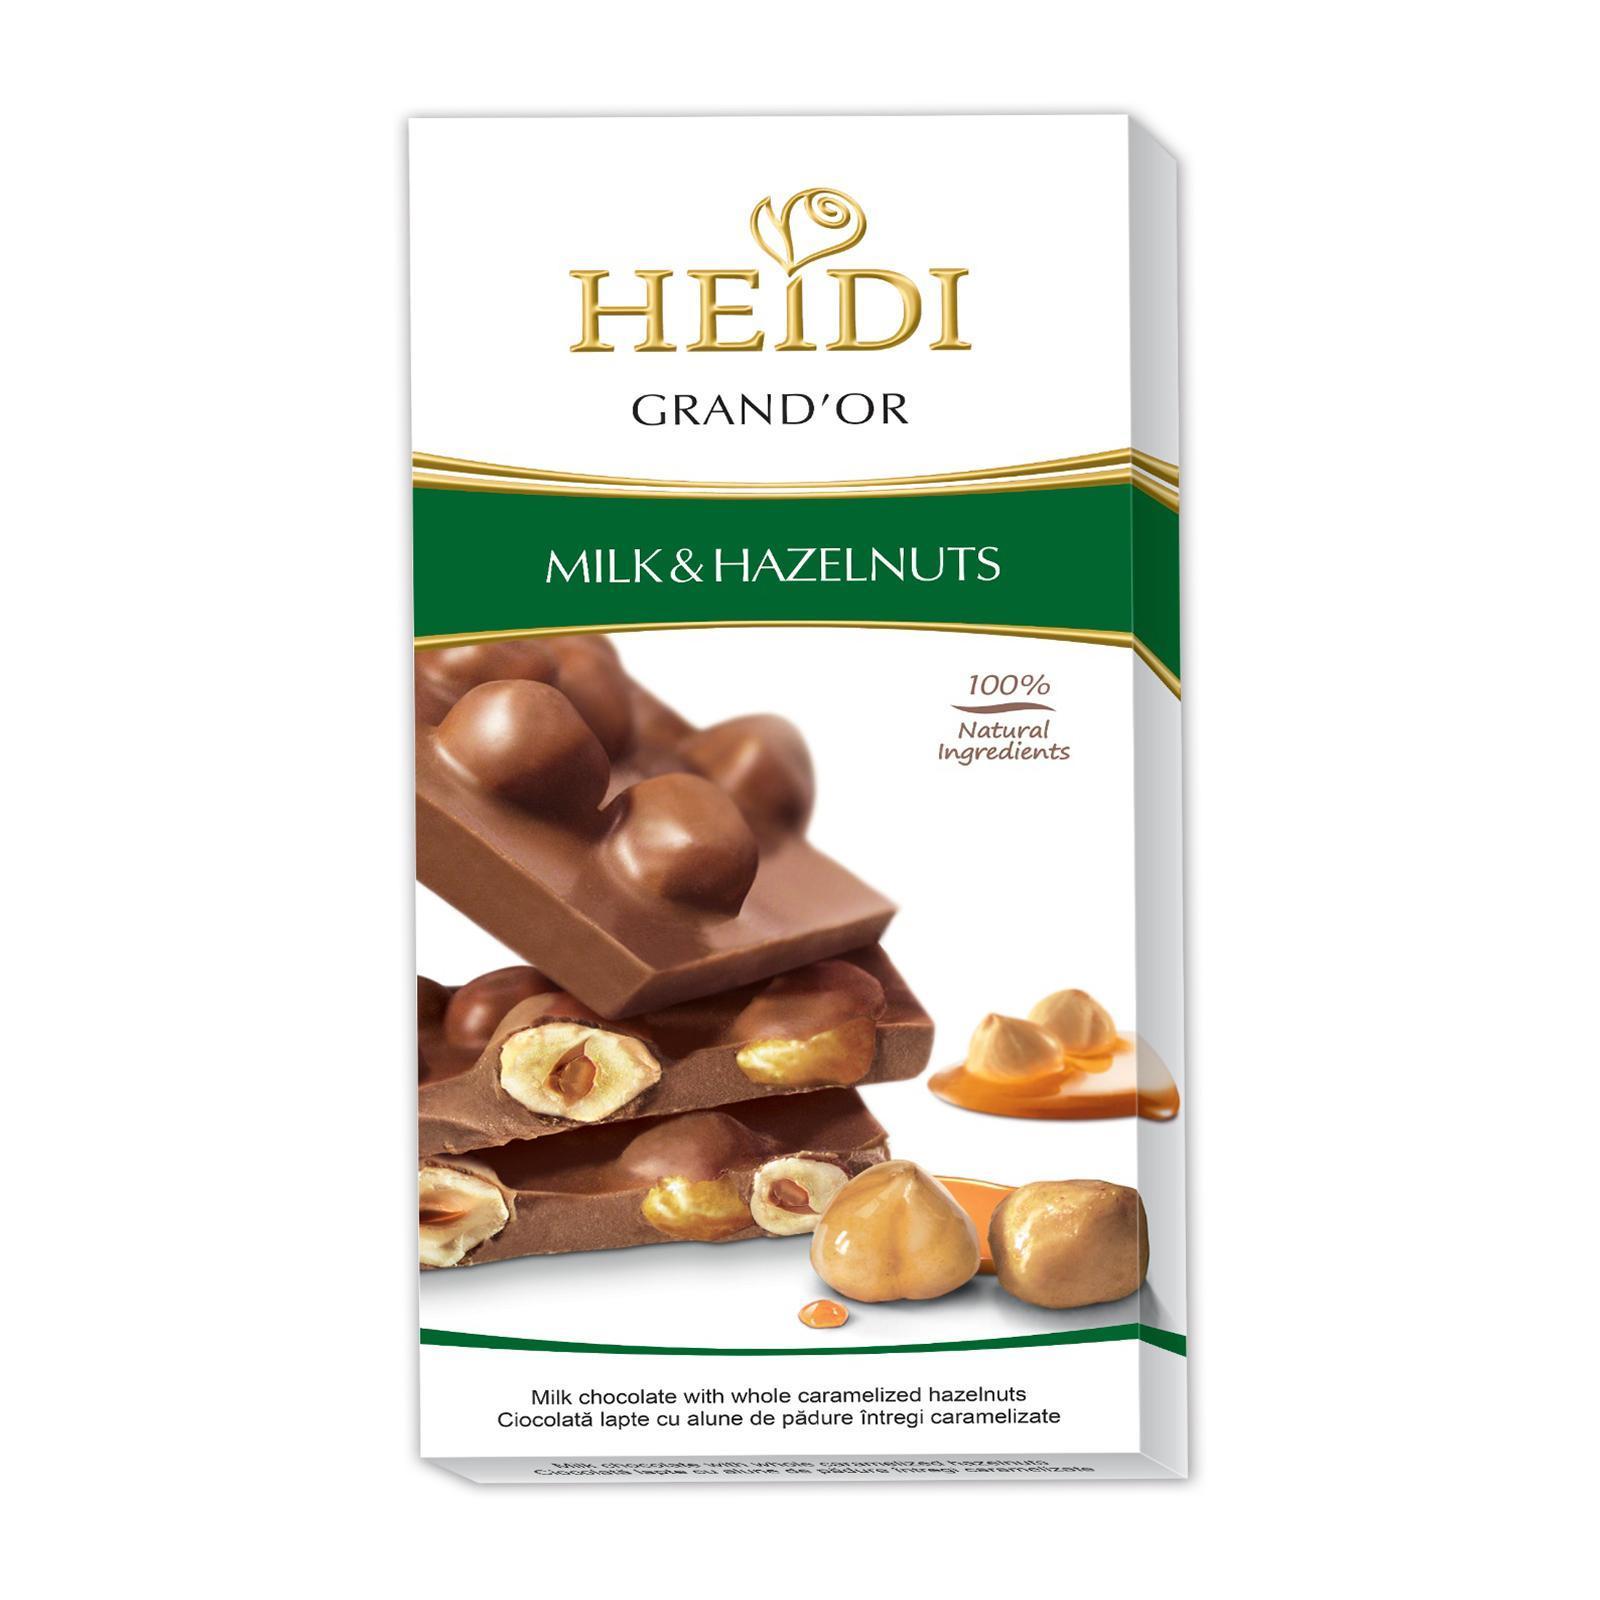 Heidi Grand 'Or Milk Chocolate With Whole Caramelized Hazelnuts